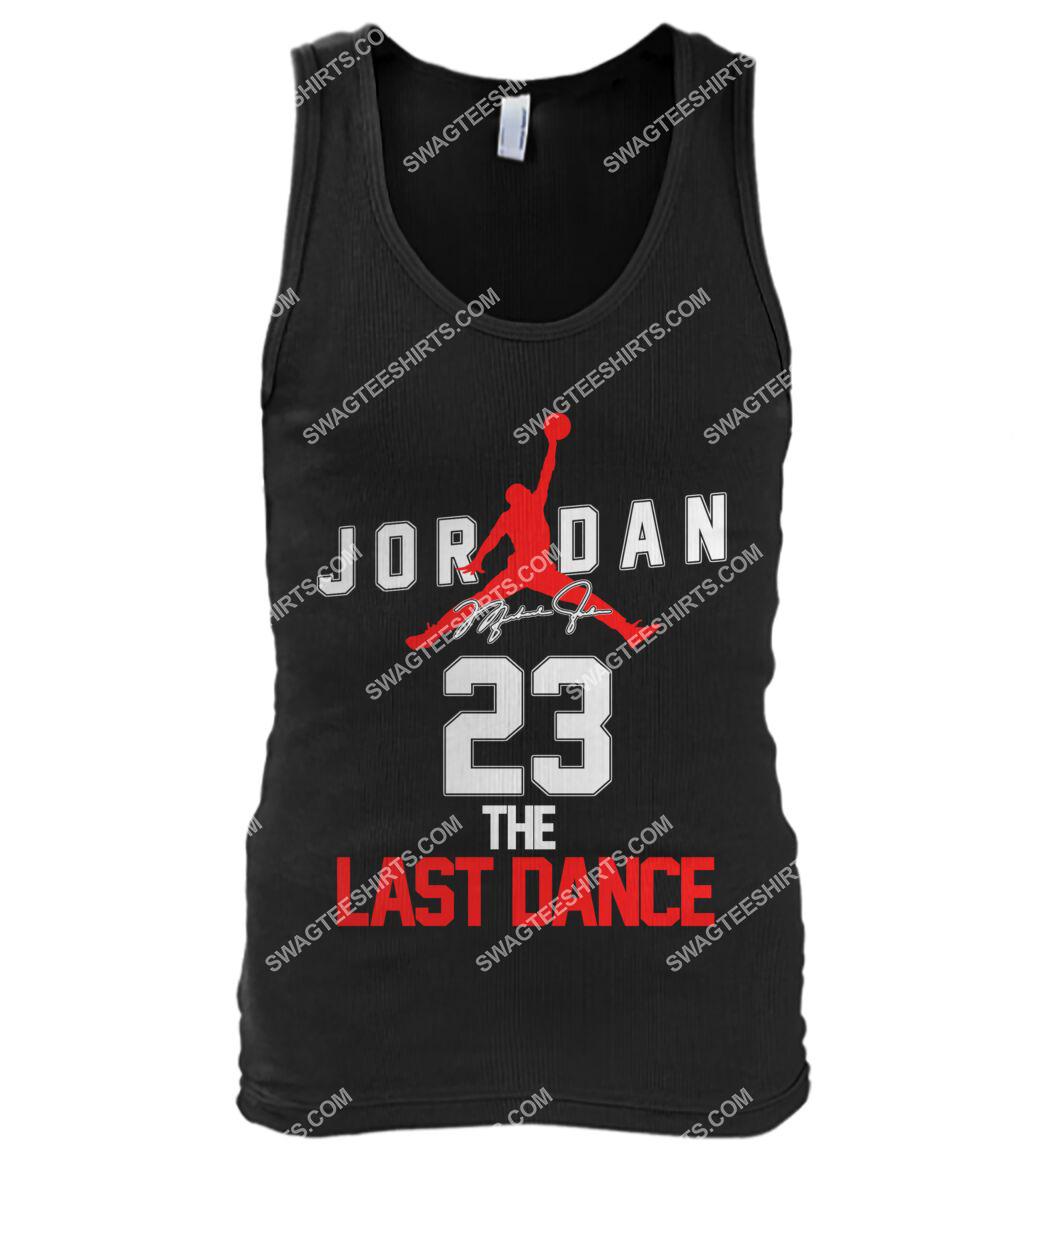 michael jordan 23 the last dance signature tank top 1